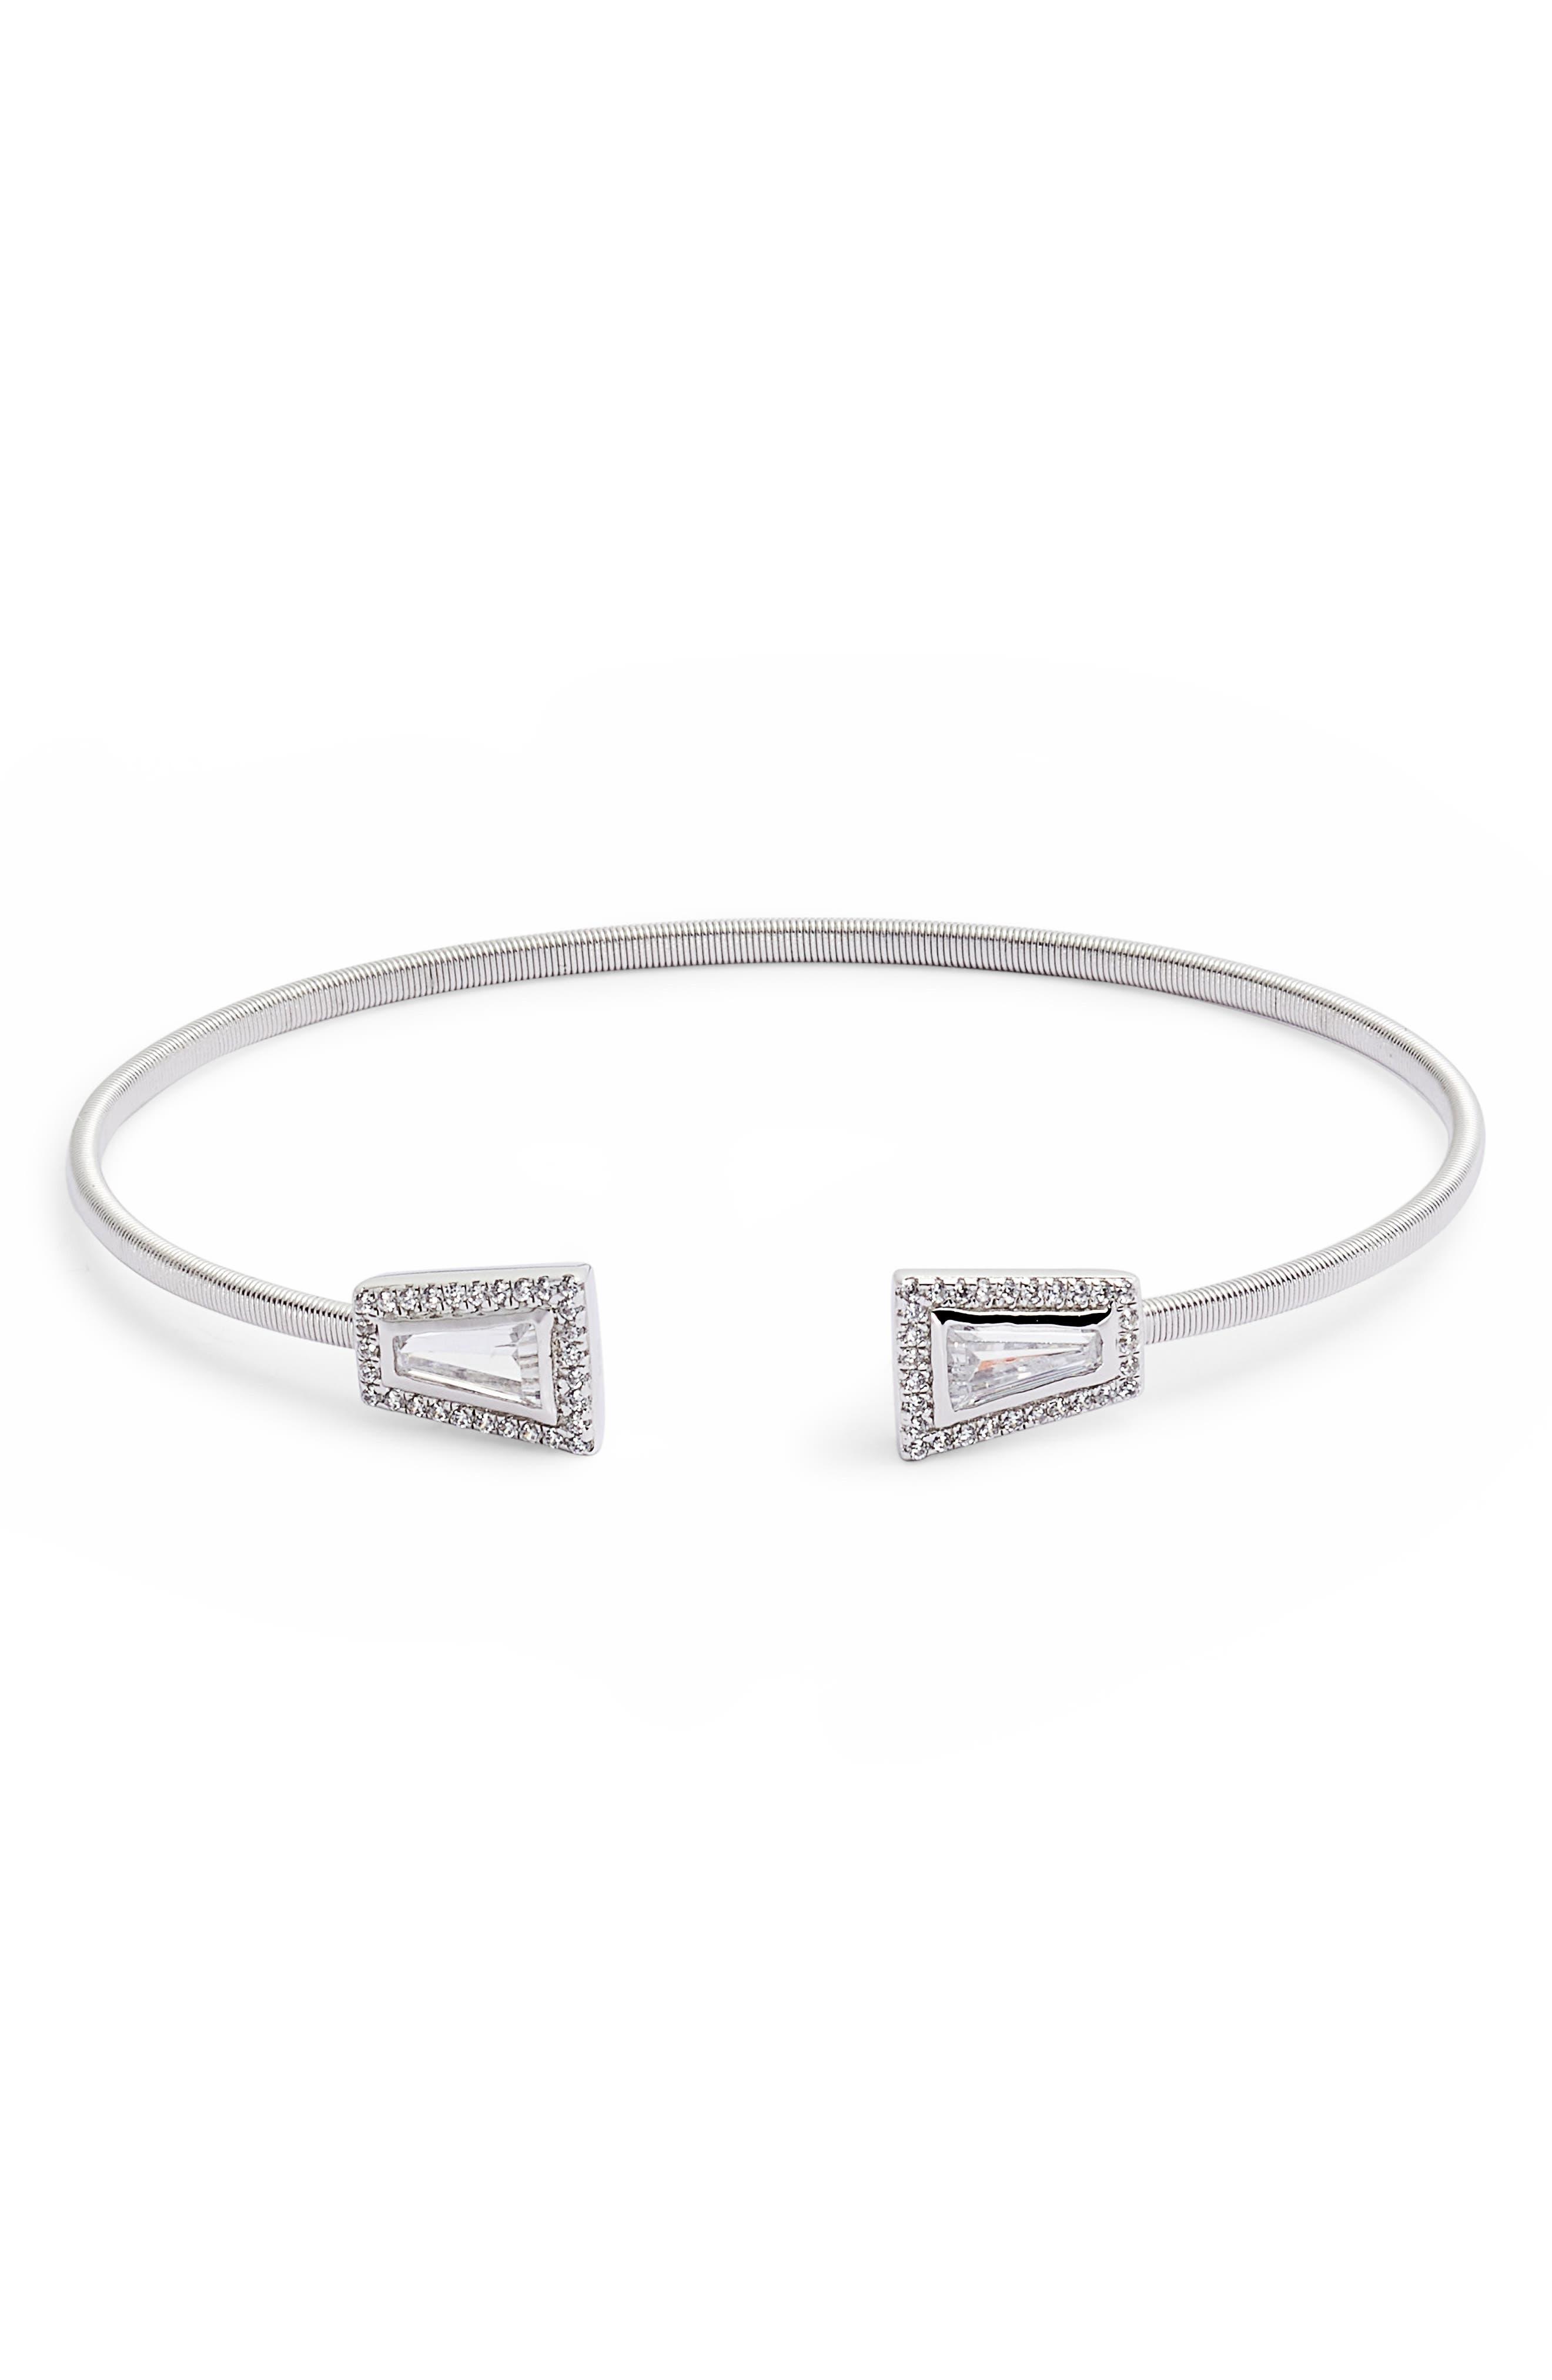 Bezel Cuff Bracelet,                         Main,                         color, SILVER/ CLEAR